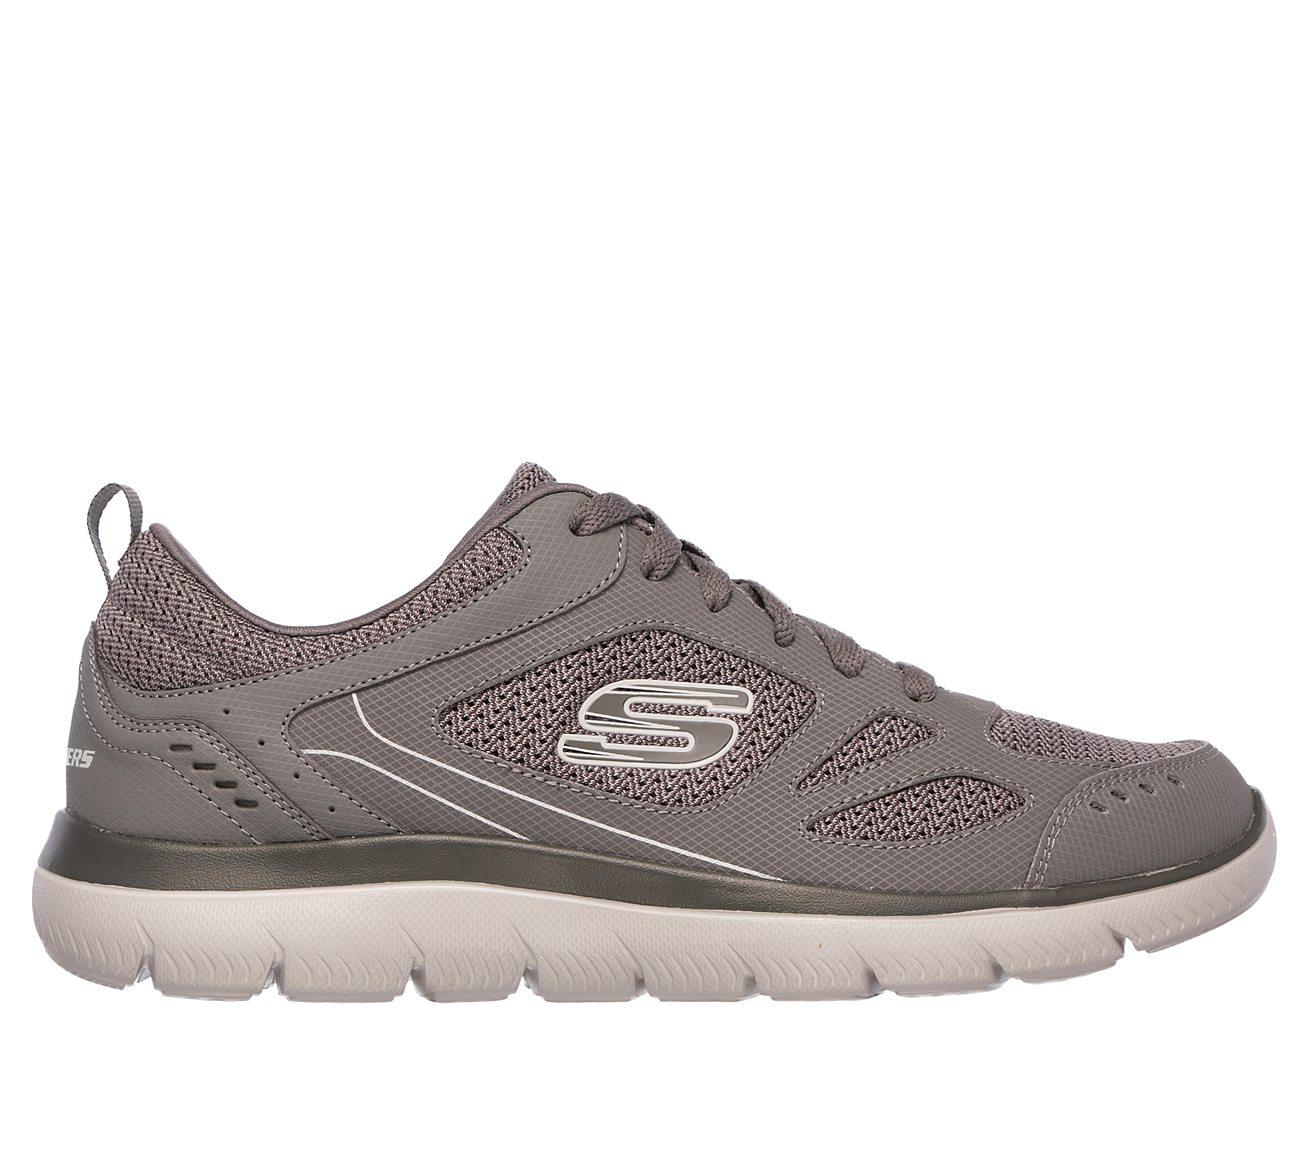 Buy Skechers Summits South Rim Skechers Sport Shoes